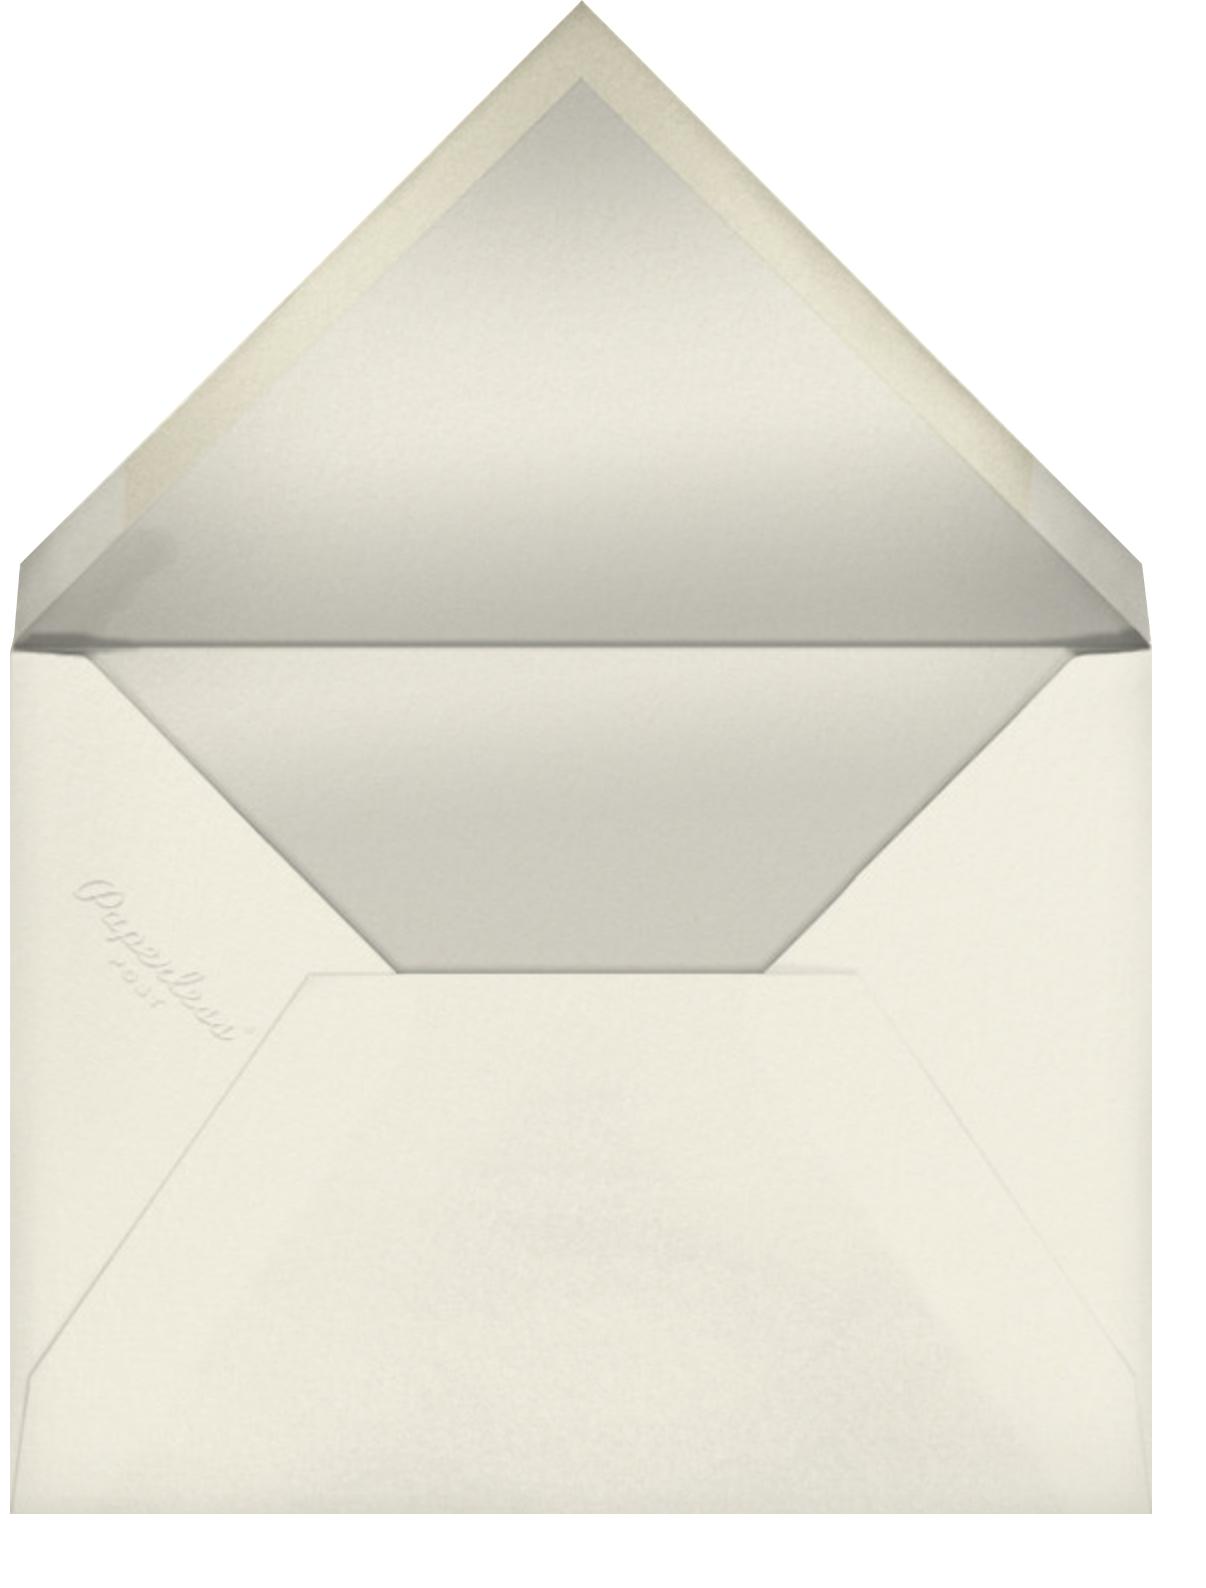 Rose (Tall) - Paperless Post - Wedding postponement - envelope back